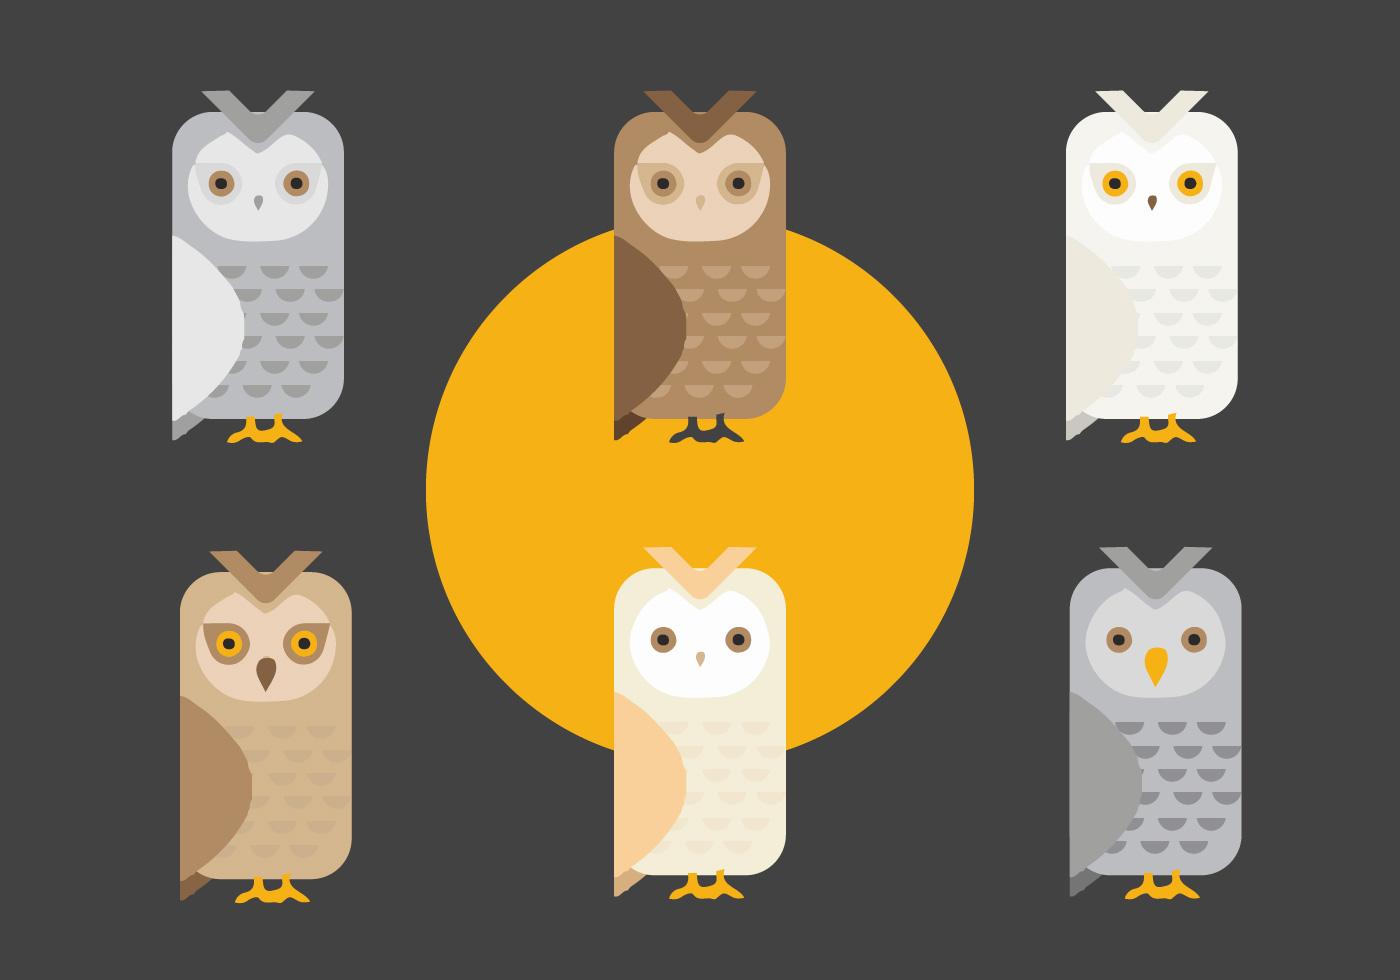 Cute Owl Cartoon Wallpaper Free Barn Owl Vector Download Free Vector Art Stock